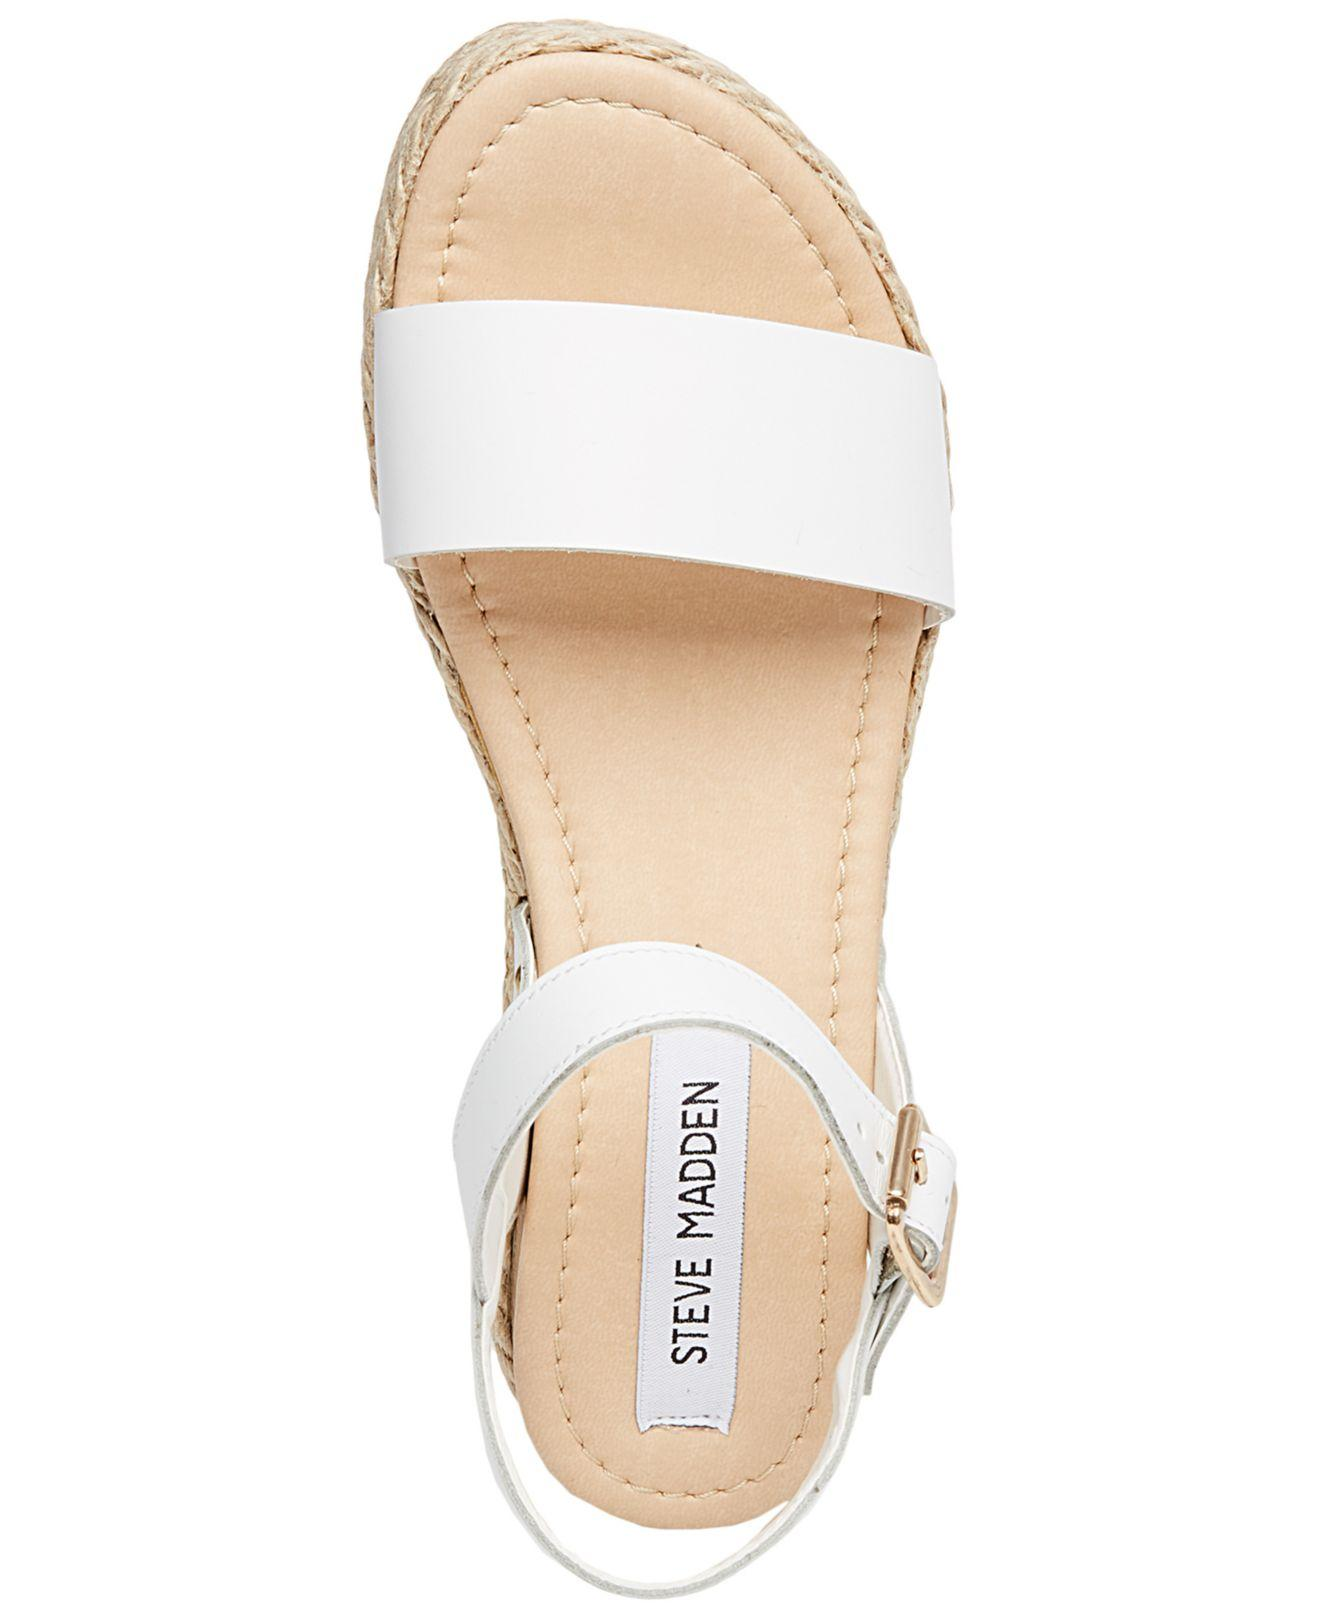 a2a9f96af47 Lyst - Steve Madden Chiara Platform Sandals in White